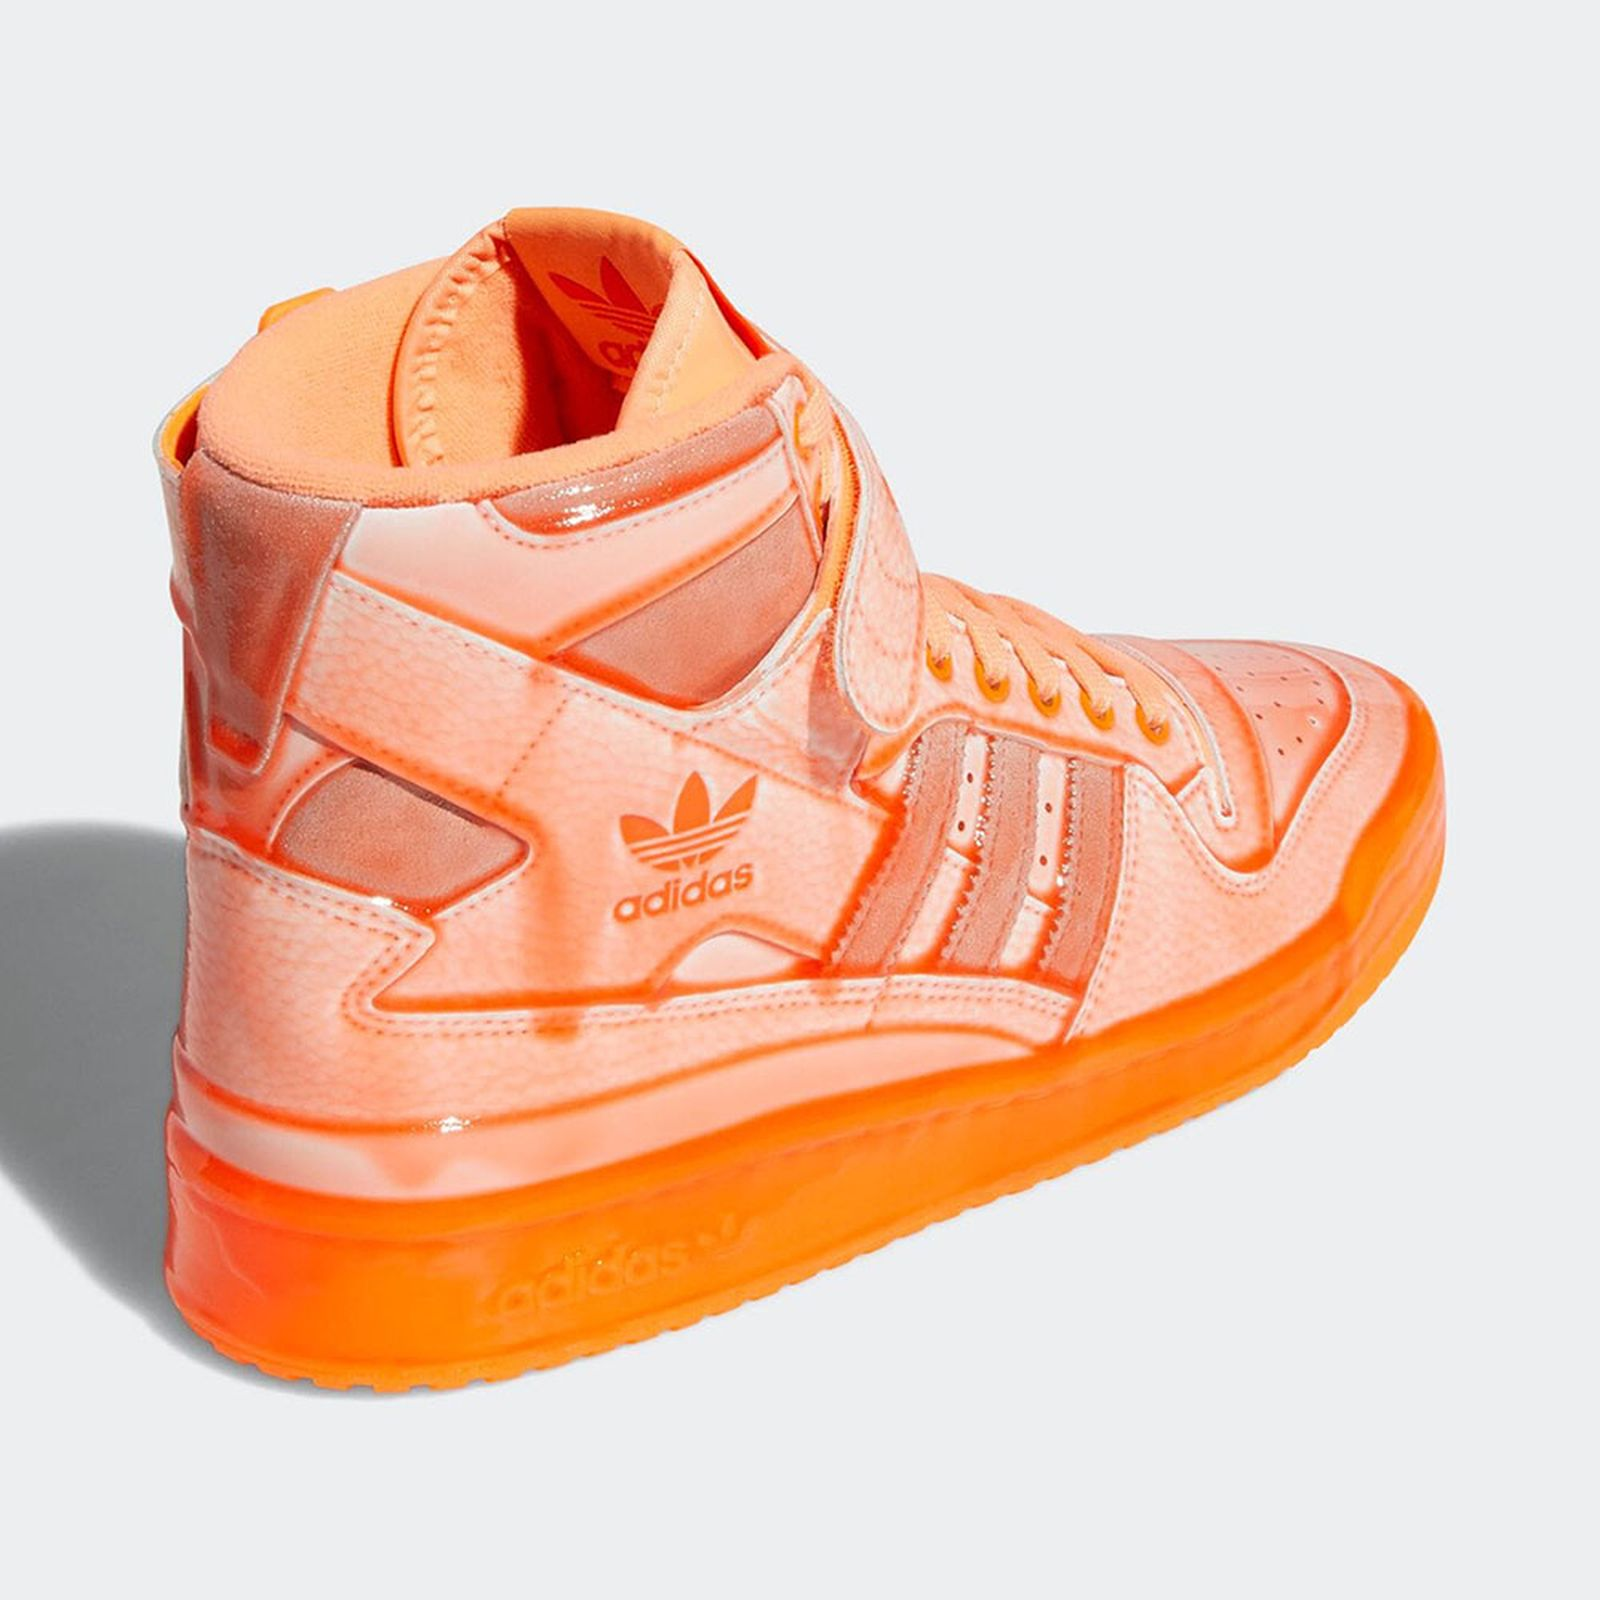 jeremy-scott-adidas-forum-hi-release-date-price-13